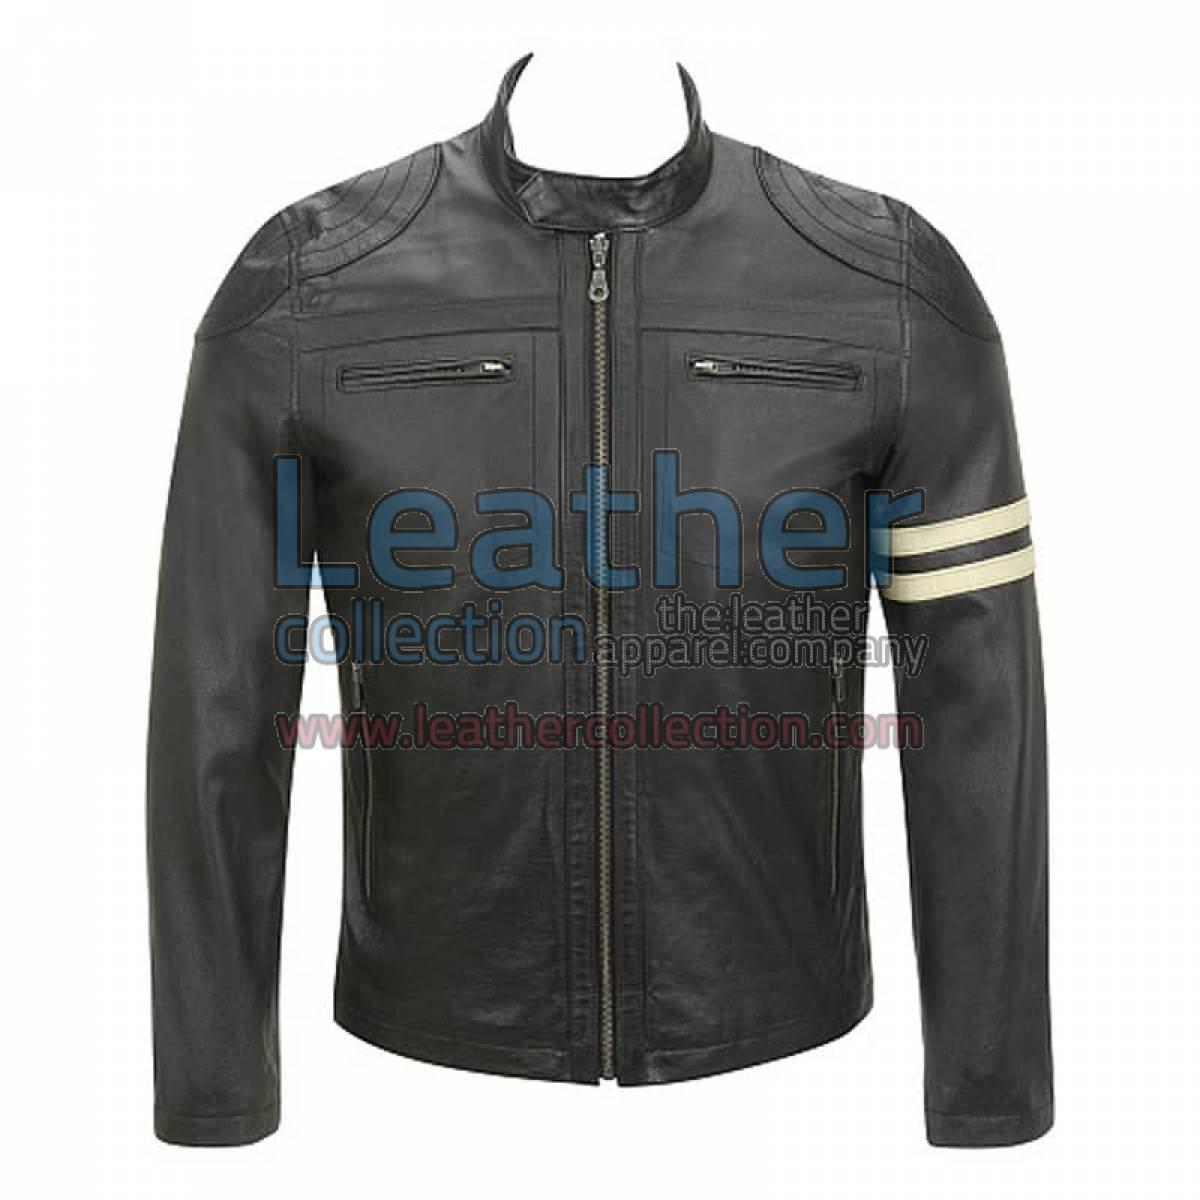 Semi Moto Stripes Leather Jacket